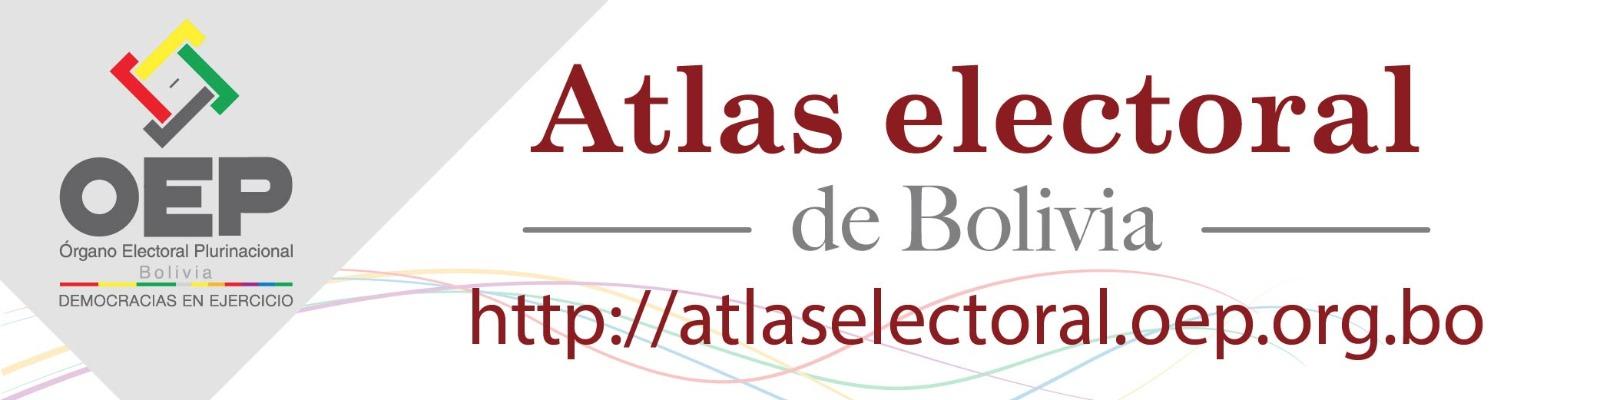 banner_atlaselectoral